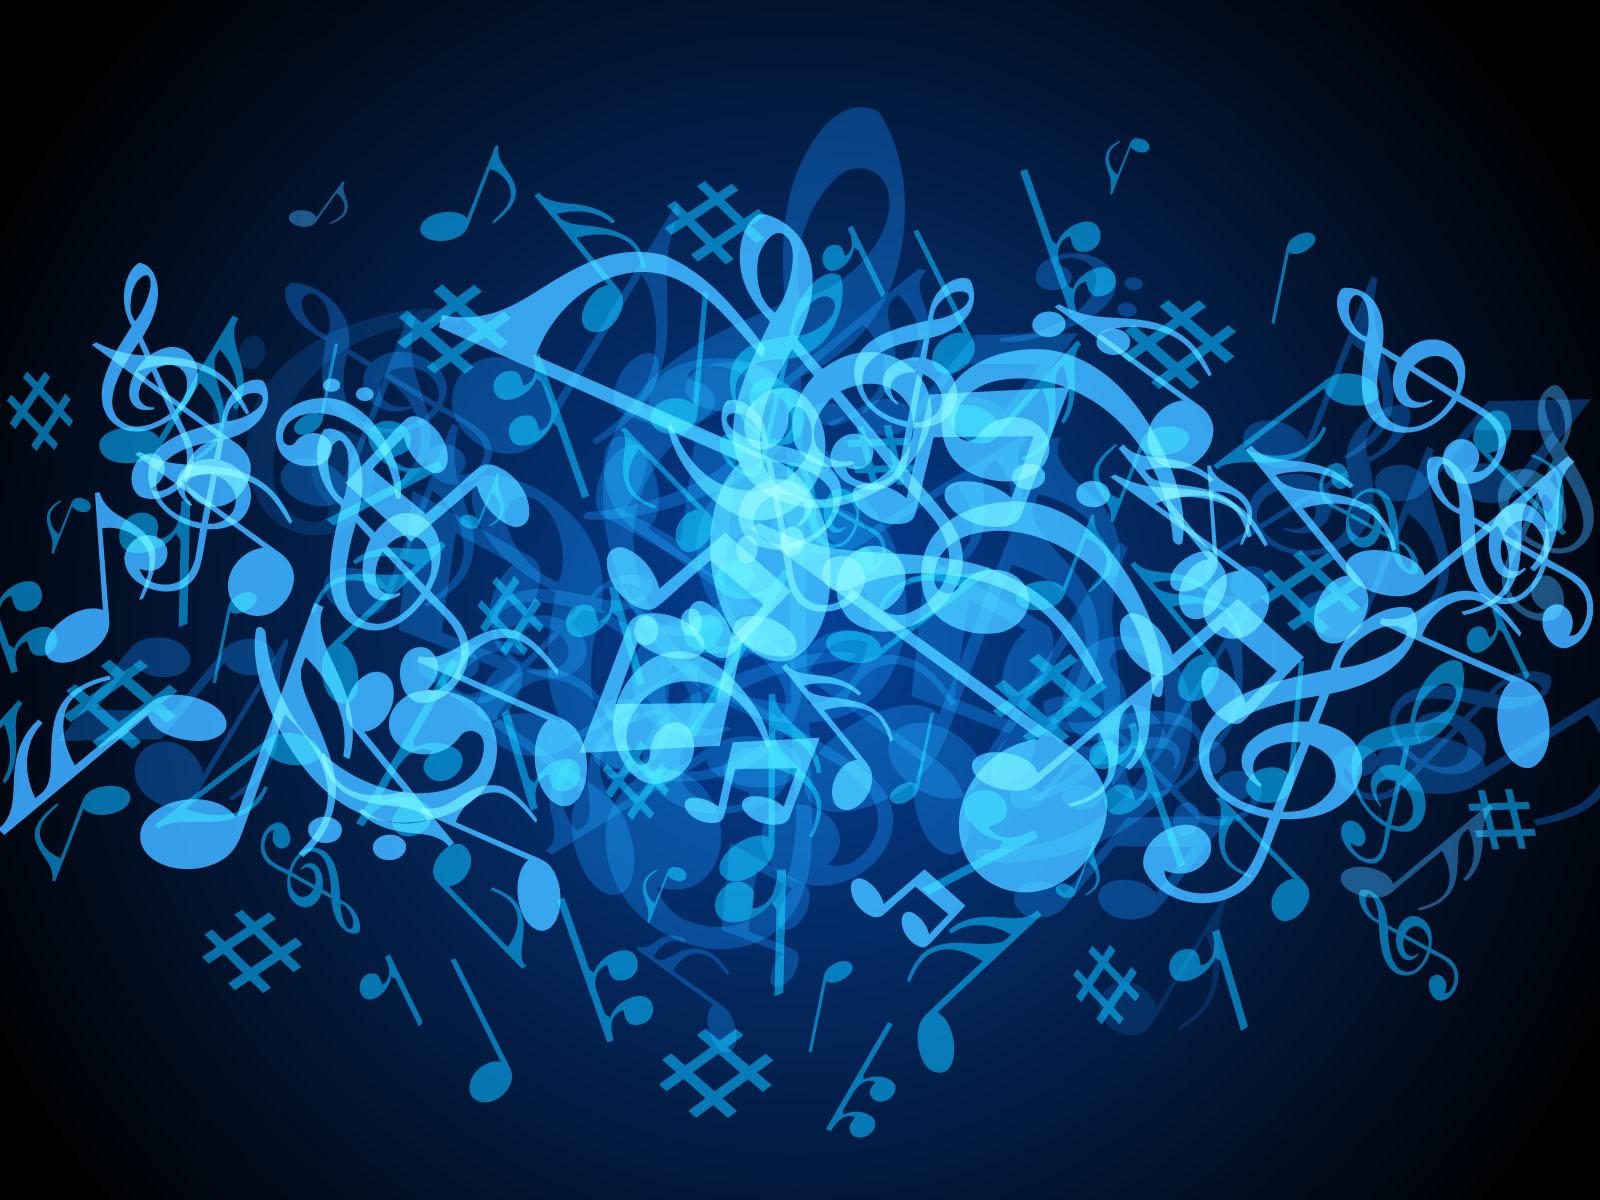 Background image music - Blue Music Notes Background 1